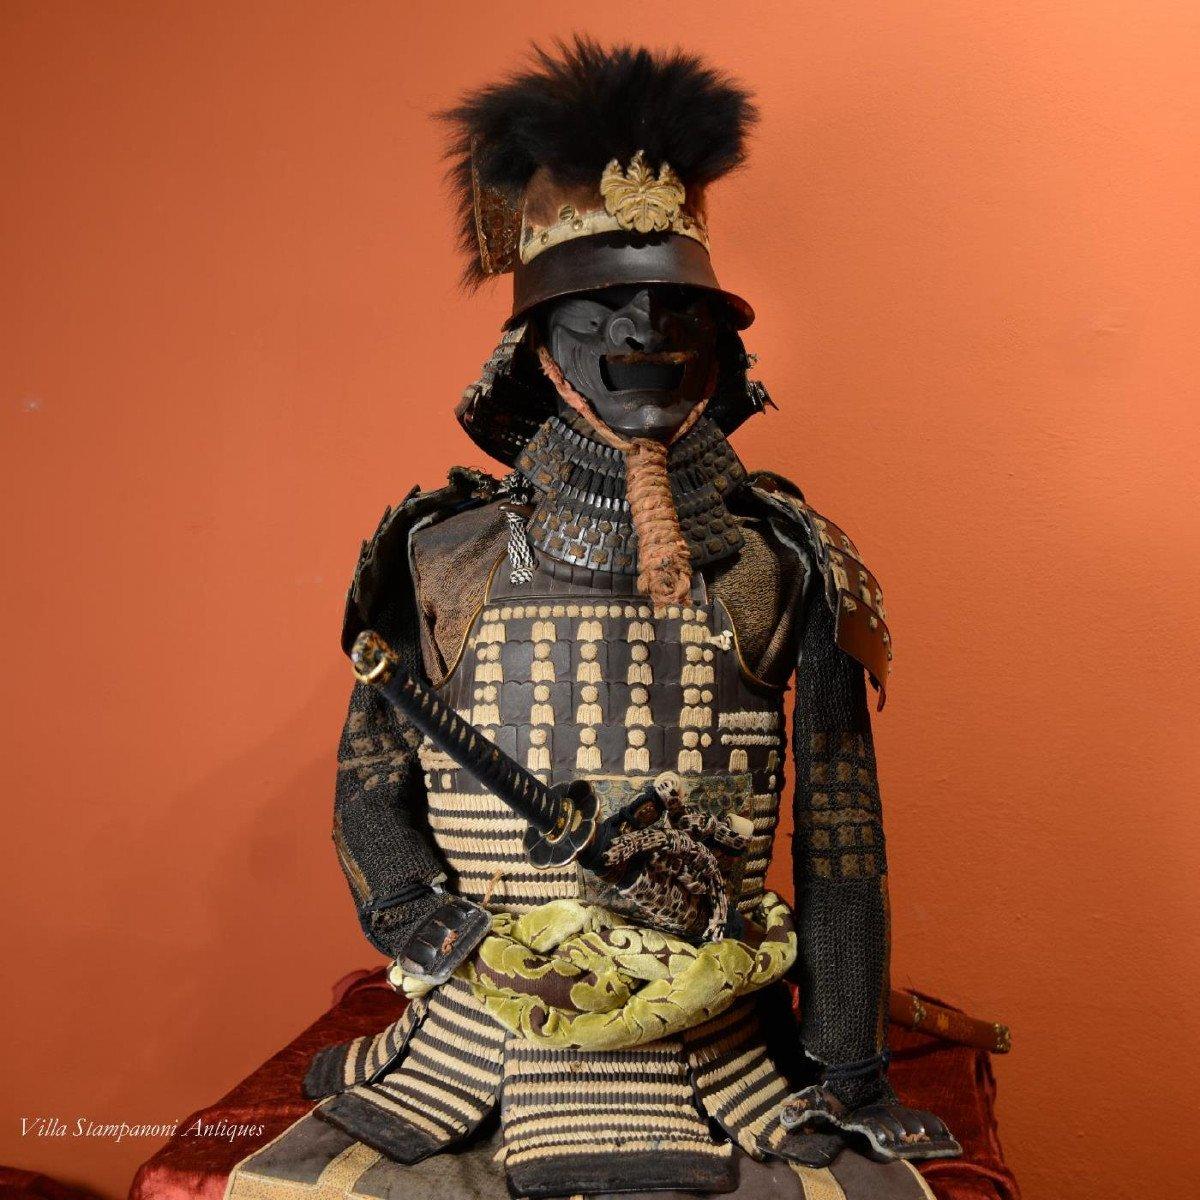 Ancienne Armure De Samouraï époque Edo